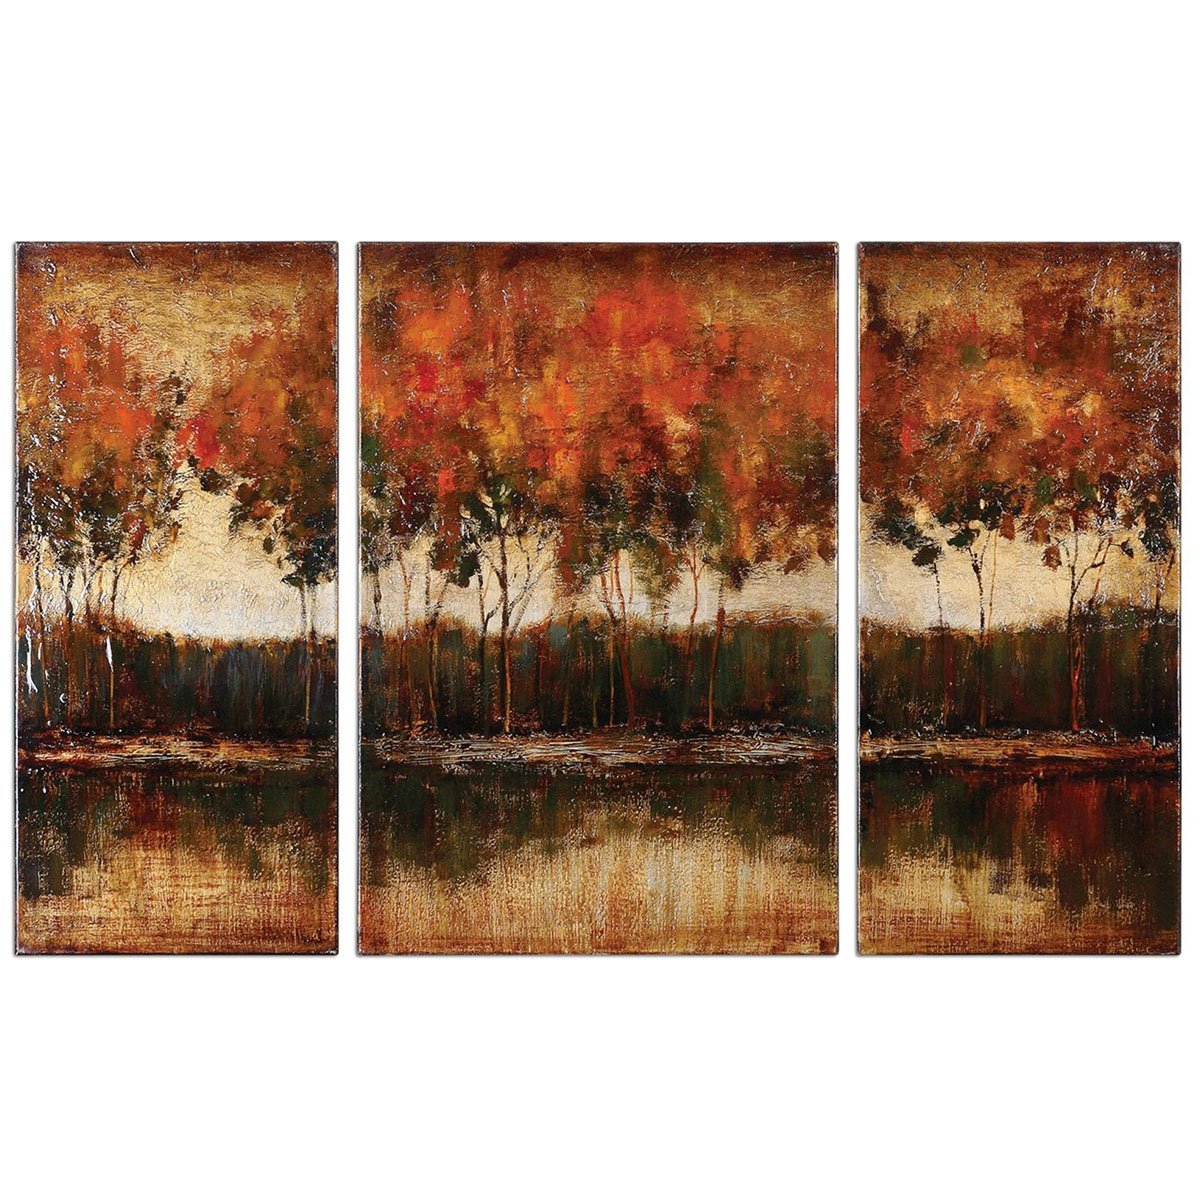 Amazon.com: Uttermost 34207 Trilakes Canvas Art (Set Of 3): Prints: Wall Art